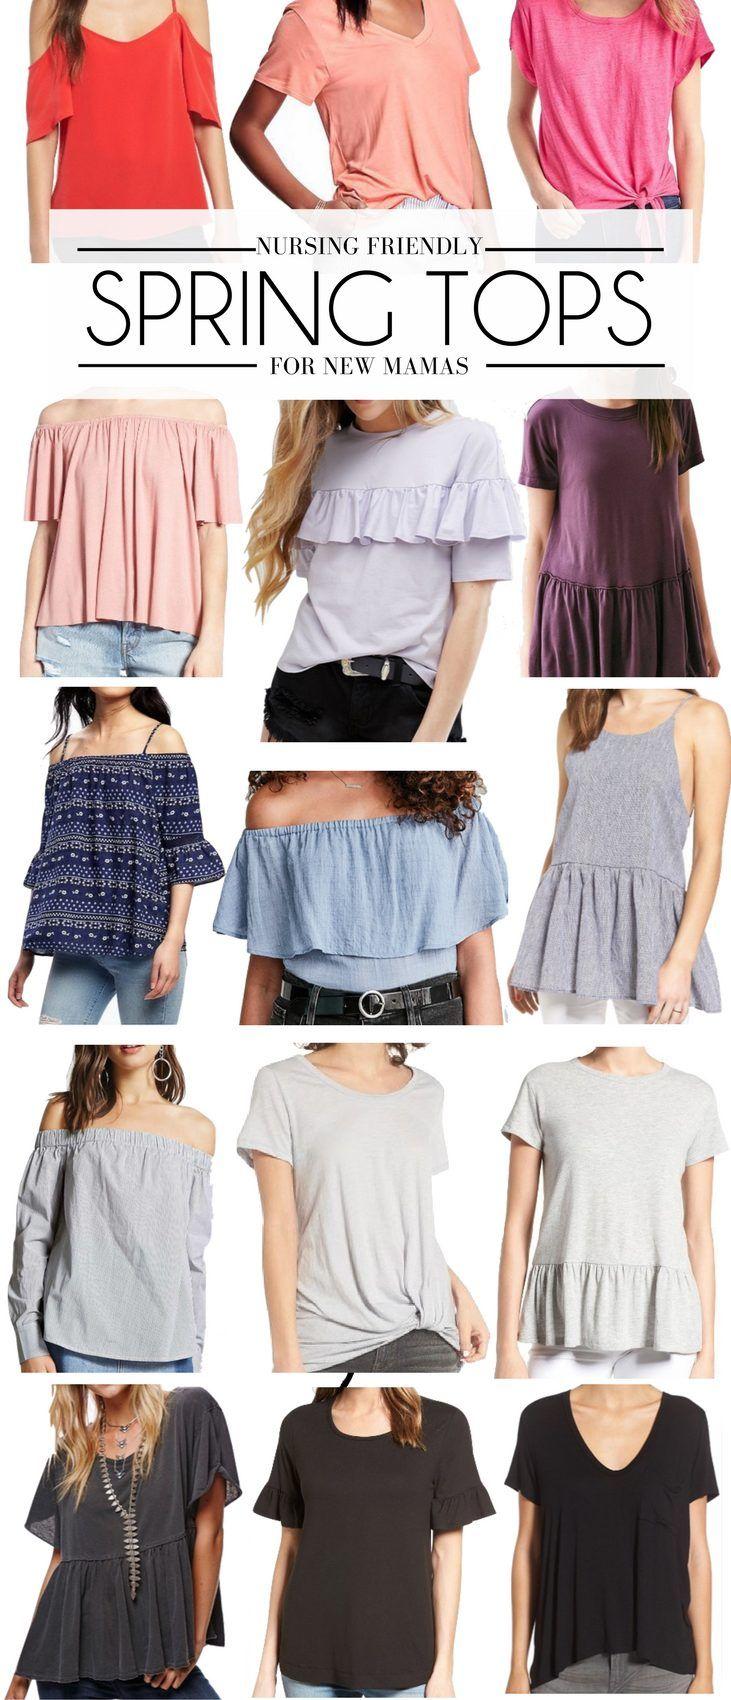 15 Nursing Friendly Spring Tops For New Moms Breastfeeding Fashion Postpartum Fashion Nursing Clothes